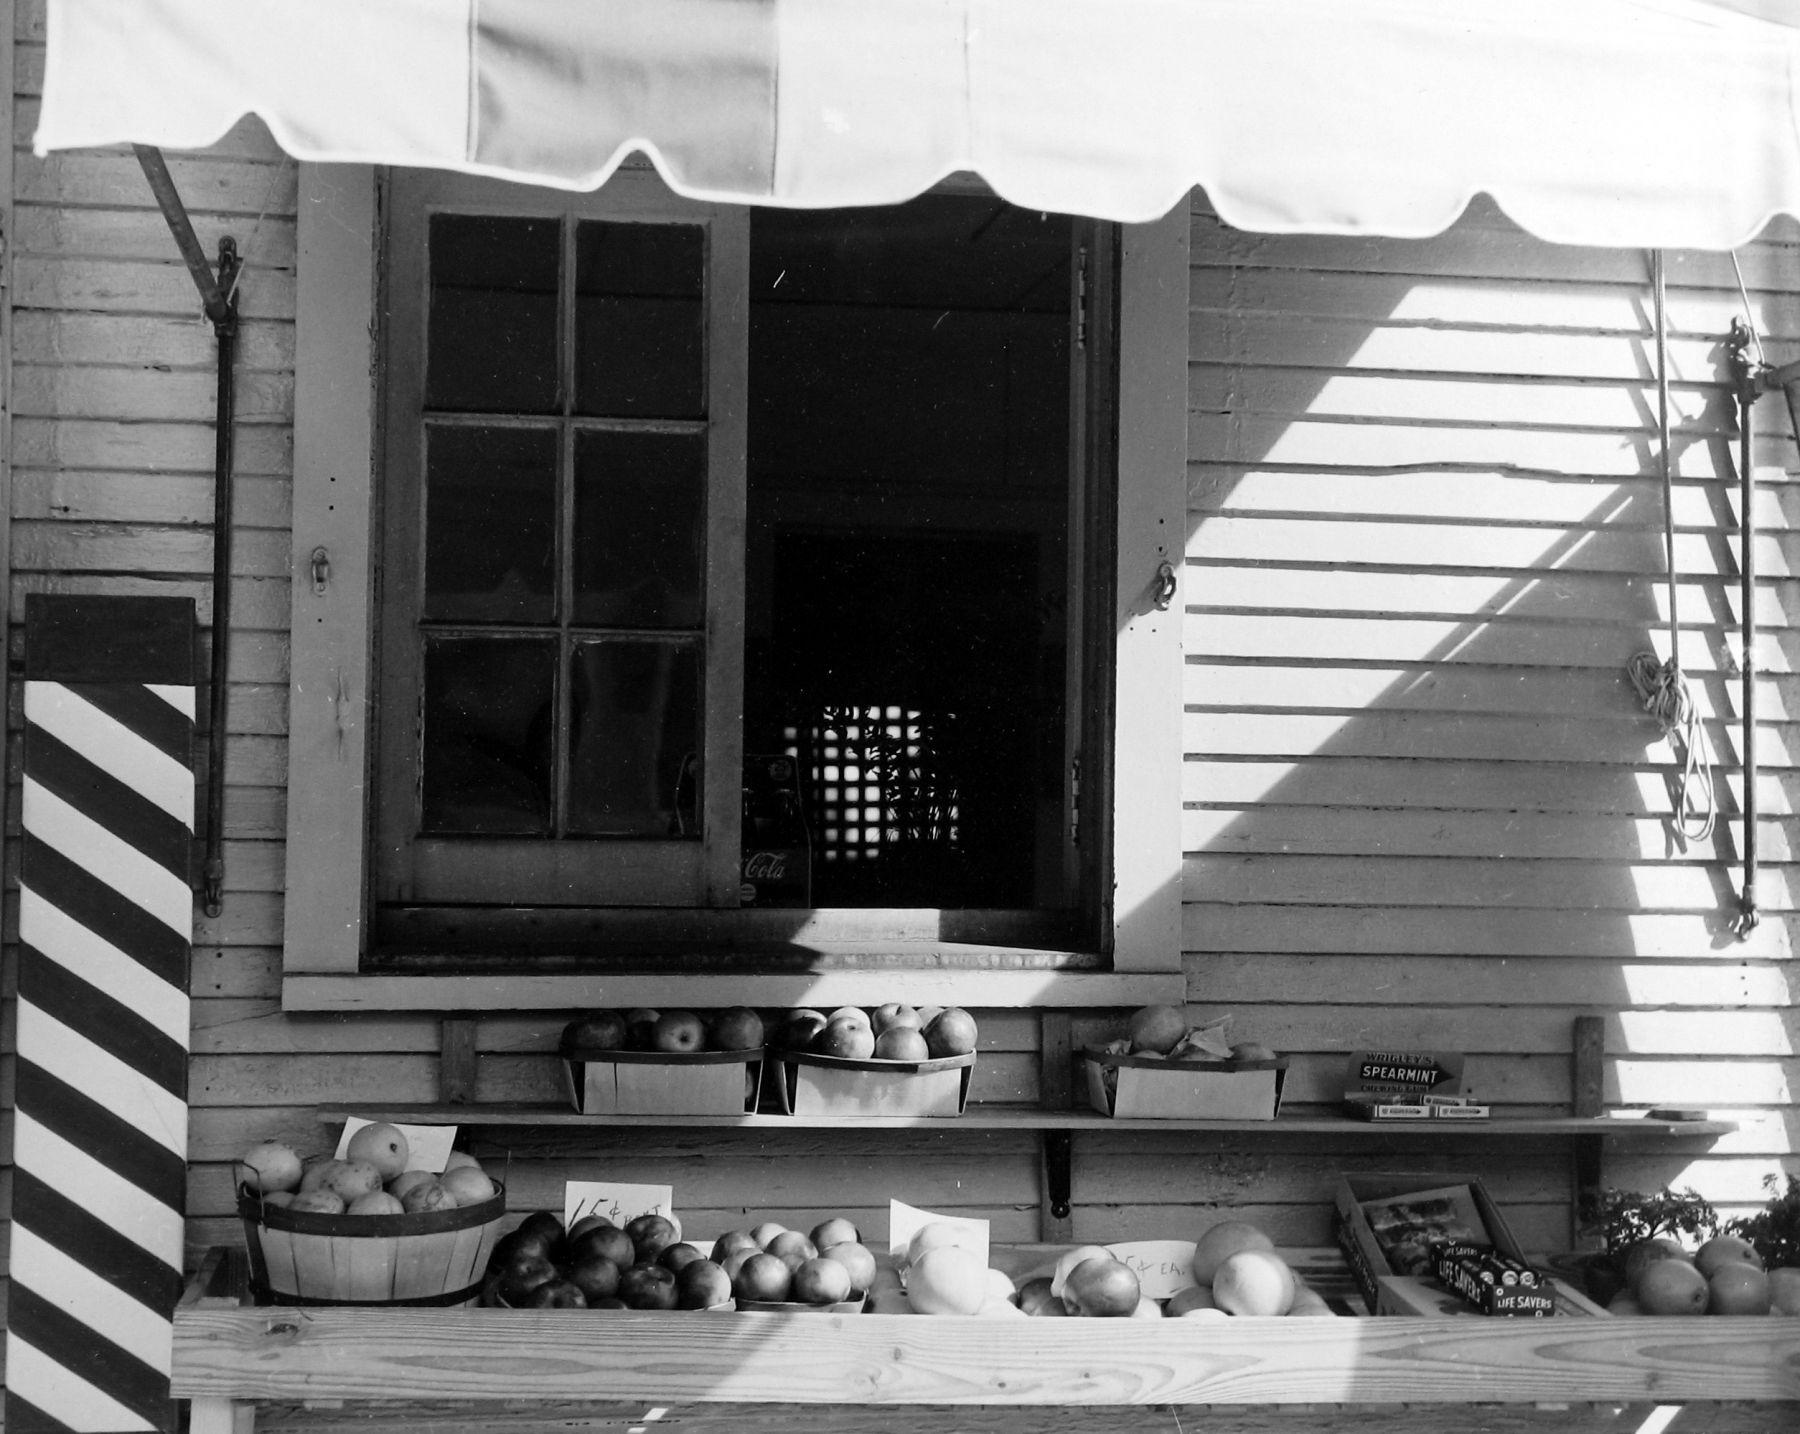 Arnold Newman - Barbershop, West Palm Beach, FL, 1940 - Howard Greenberg Gallery - 2018